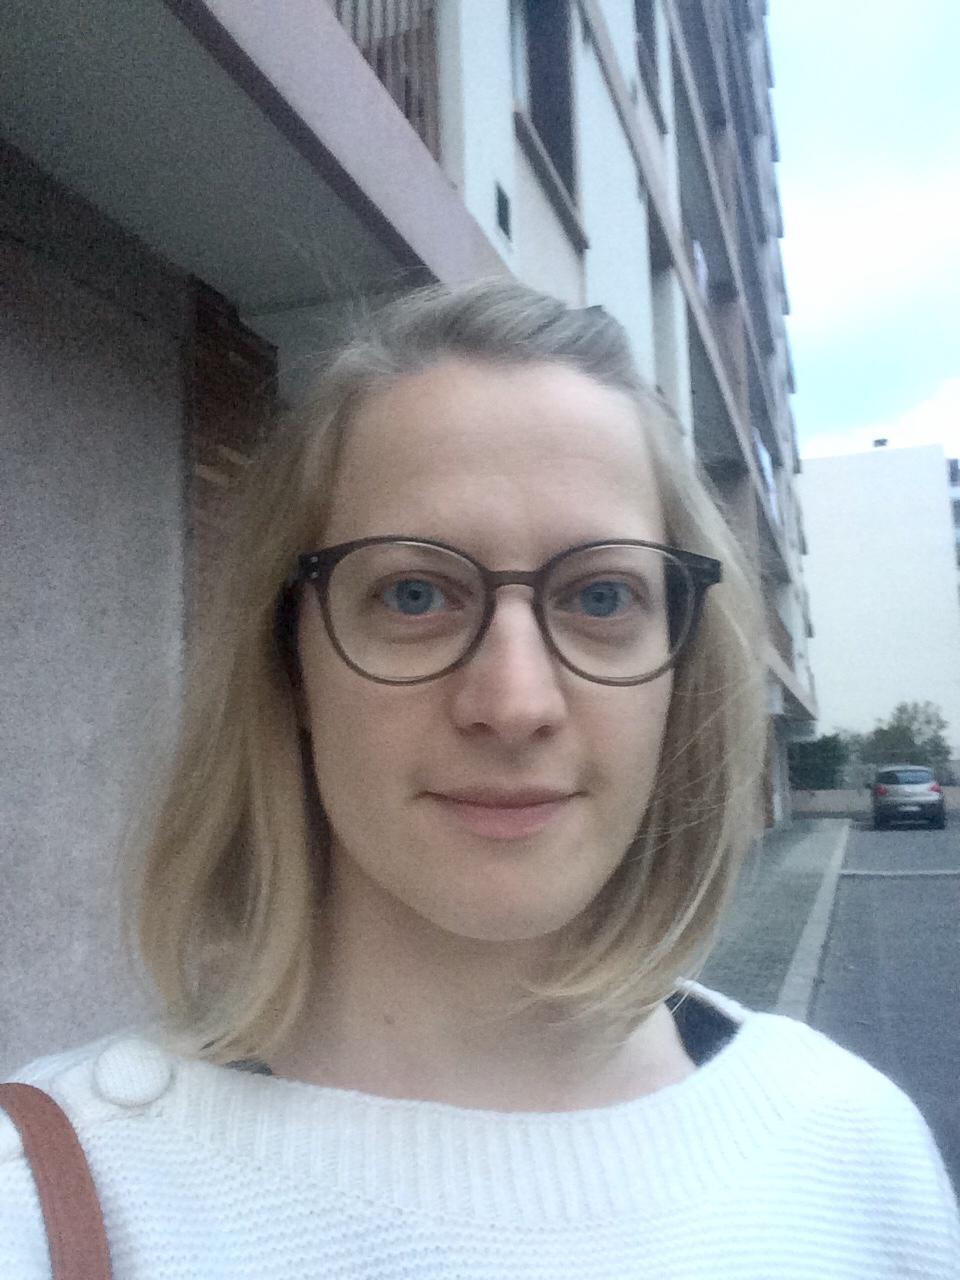 Justine Marichal